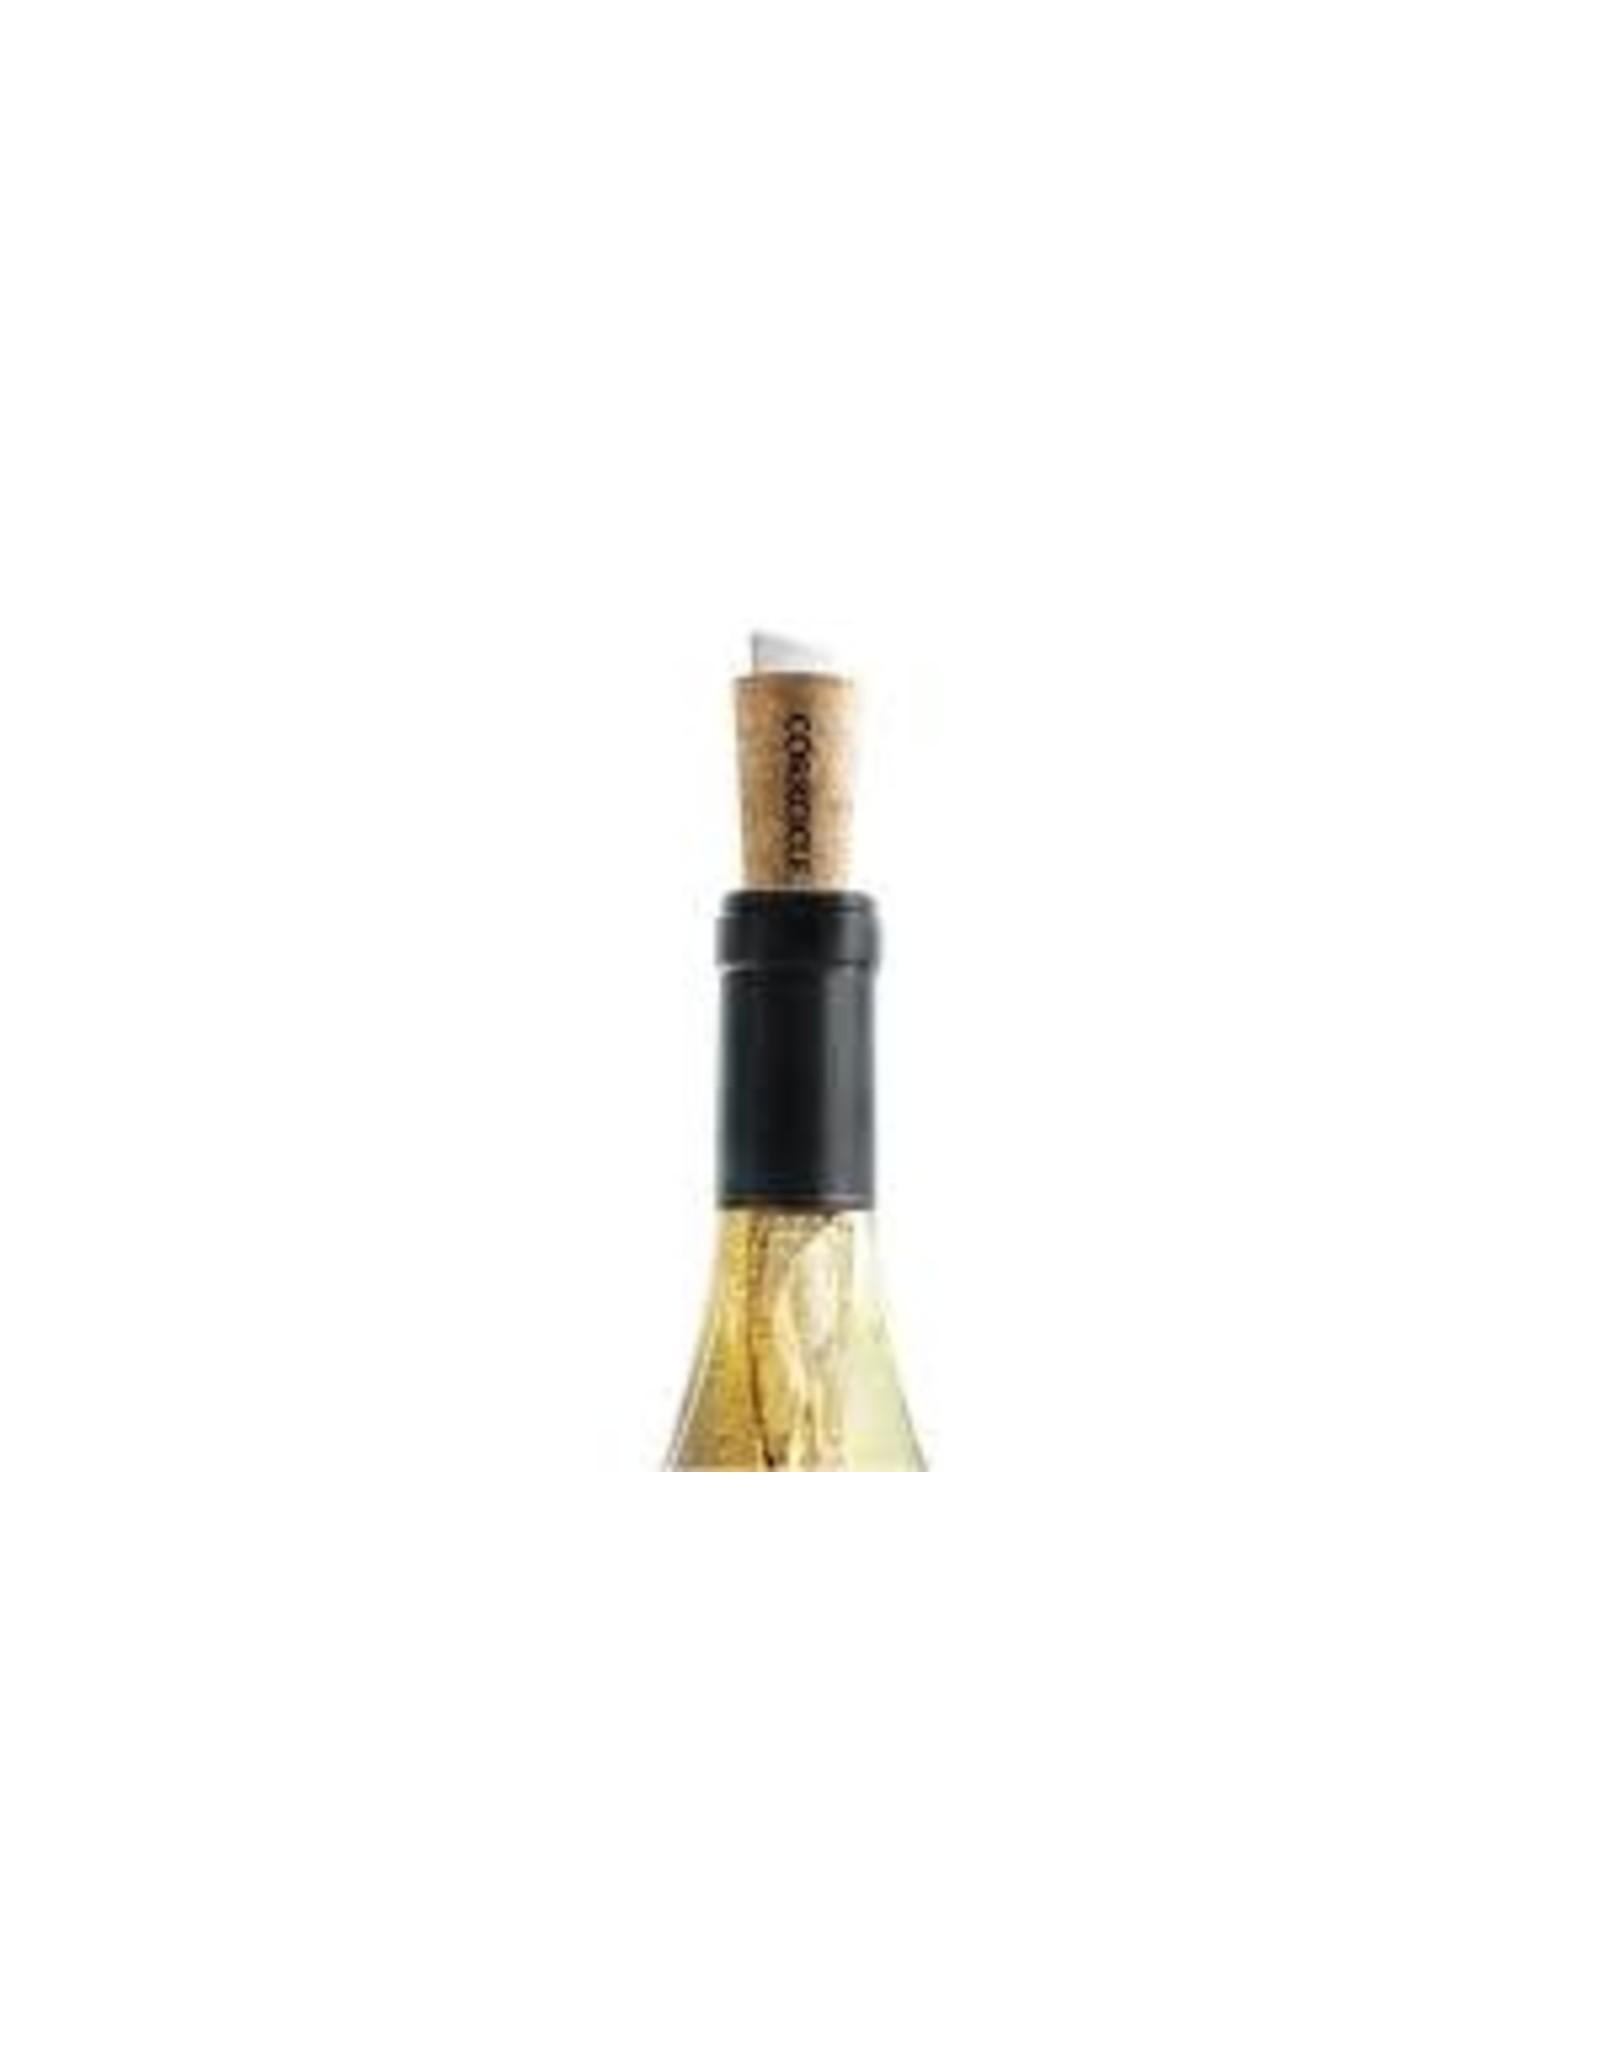 Scantrade Corkcircle Wine